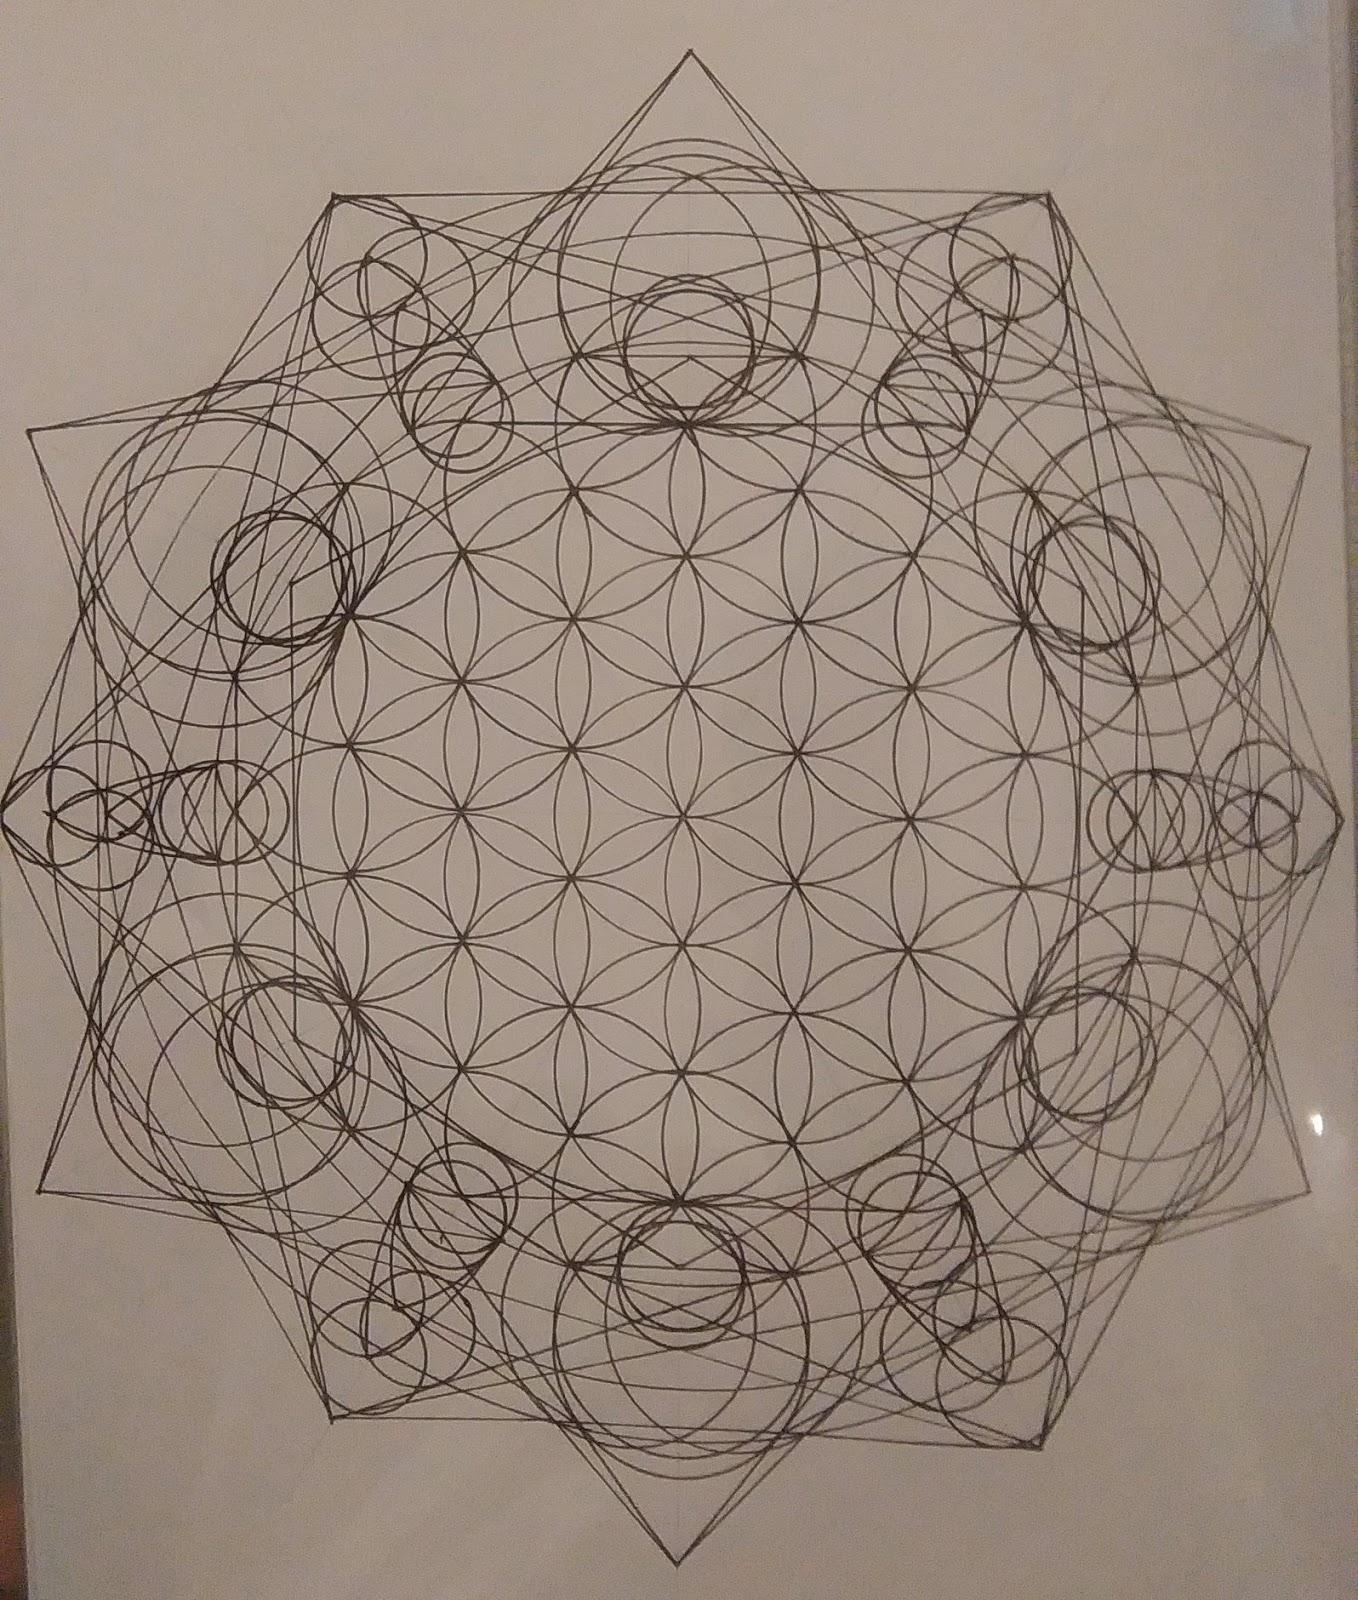 [SPOLYK] - Geometries & sketches - Page 6 48059308_1103195326533817_2178709129688776704_o